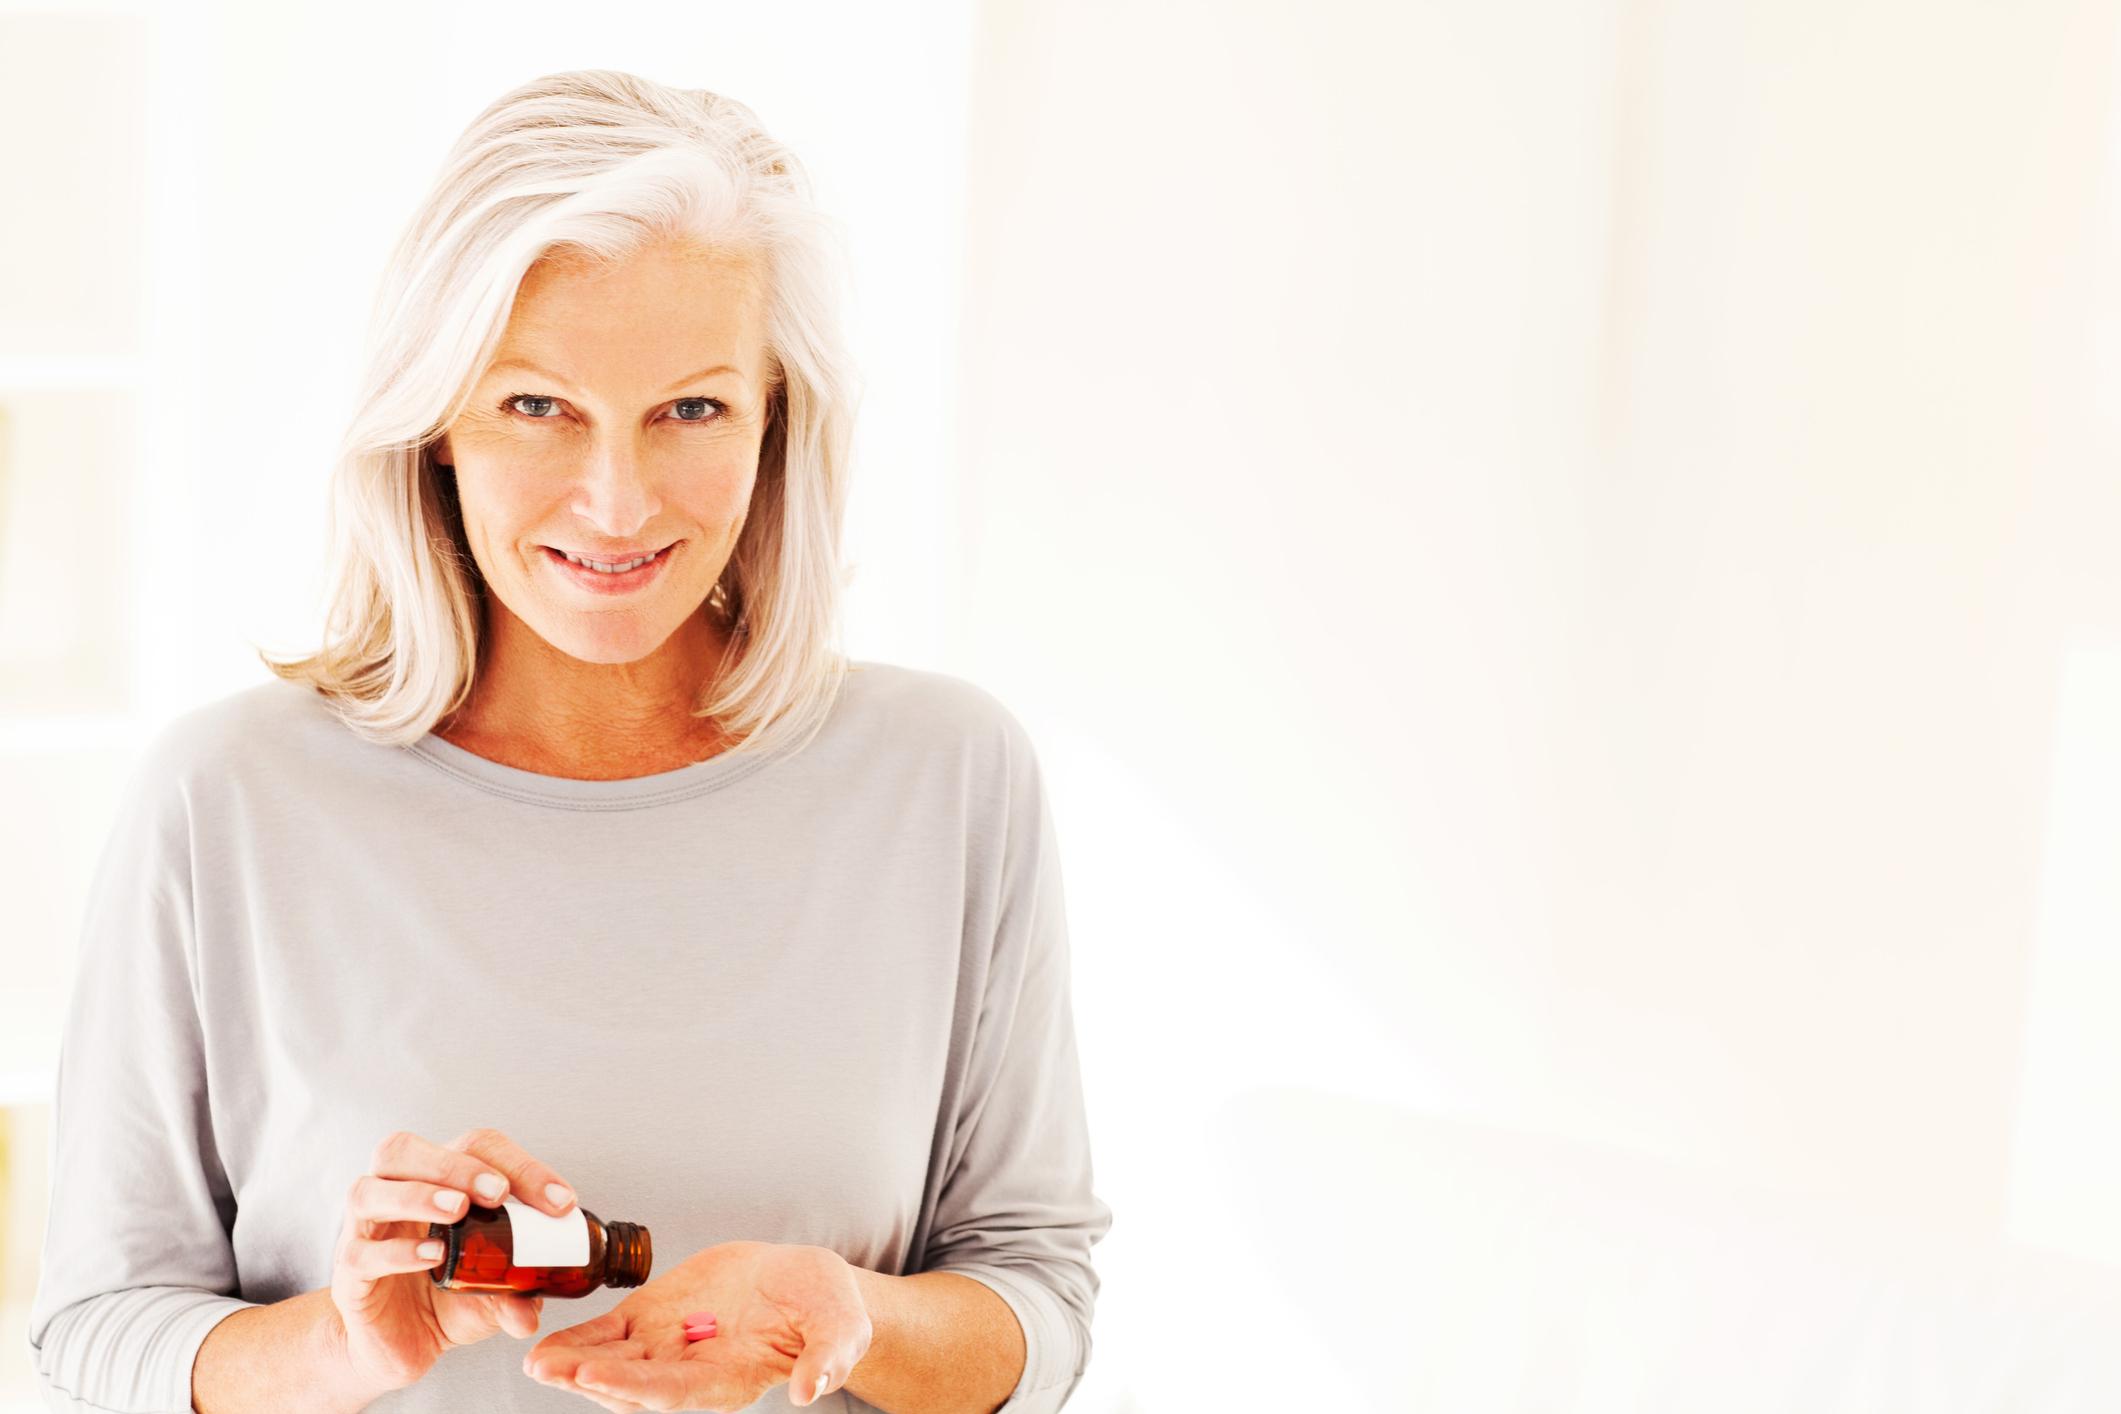 5 Benefits of Managing Menopause with Probiotics